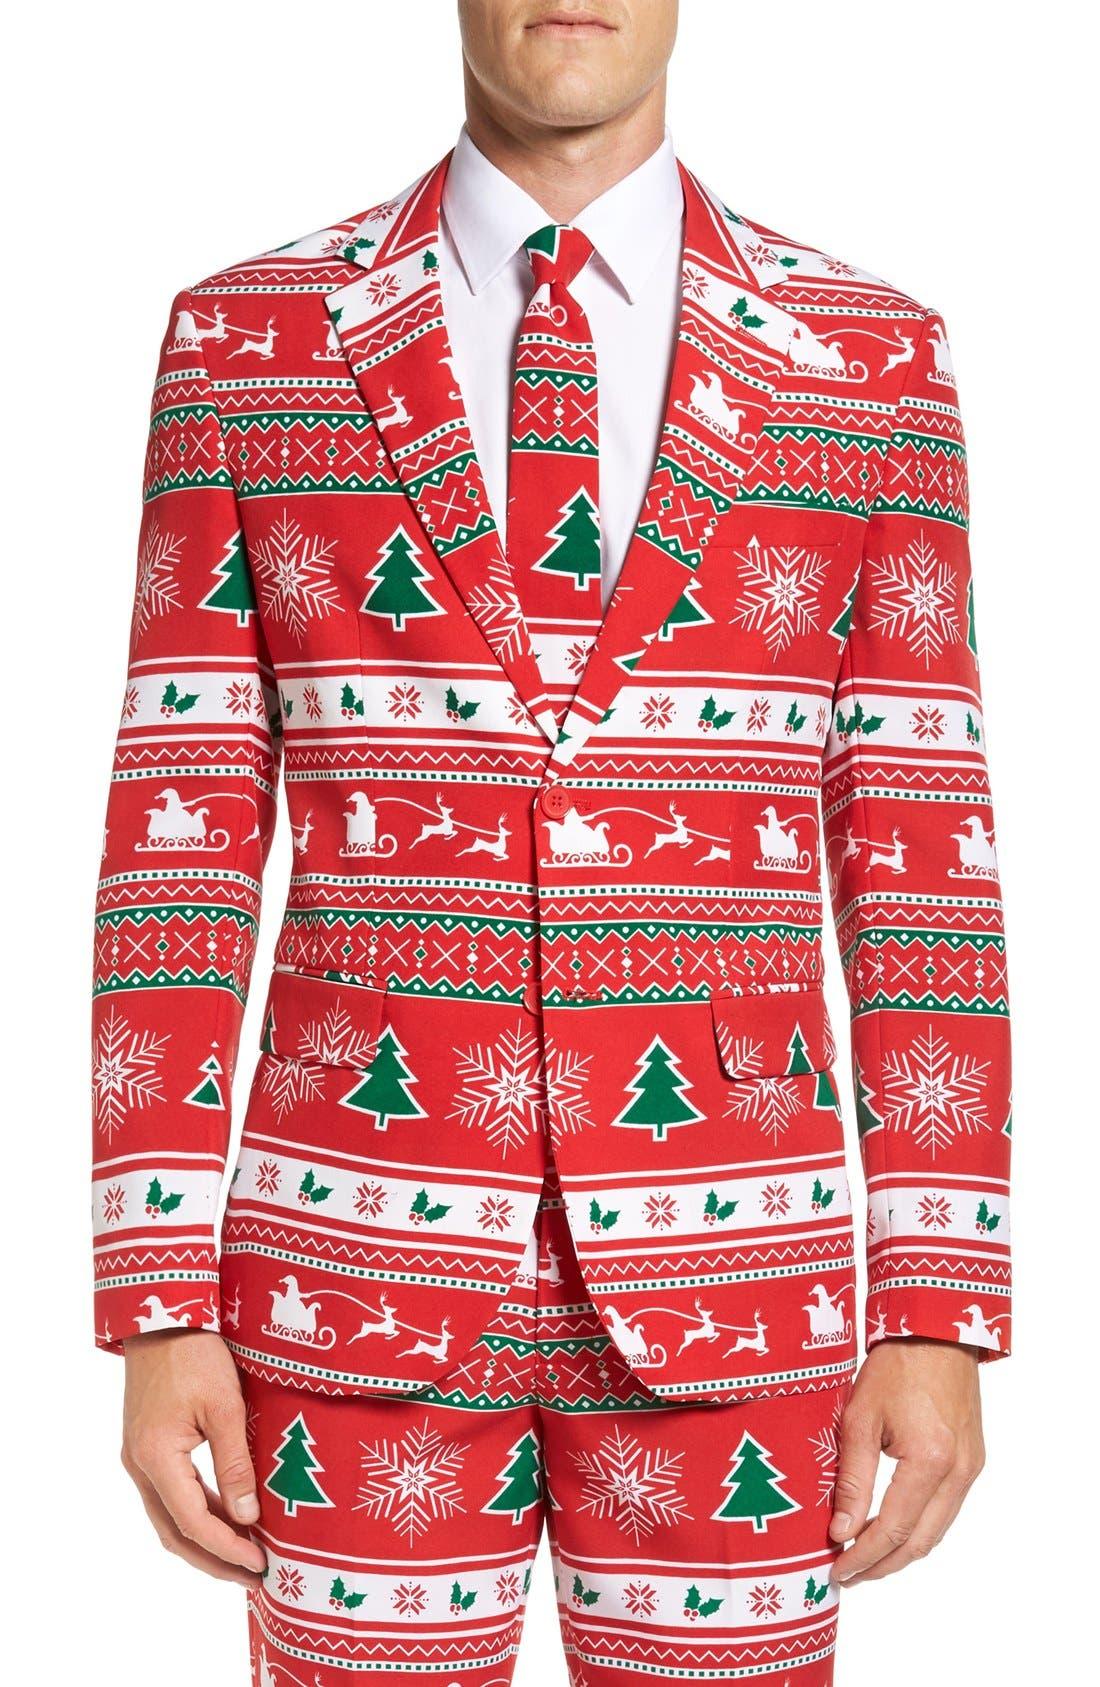 'Winter Wonderland' Trim Fit Two-Piece Suit with Tie,                             Alternate thumbnail 5, color,                             601